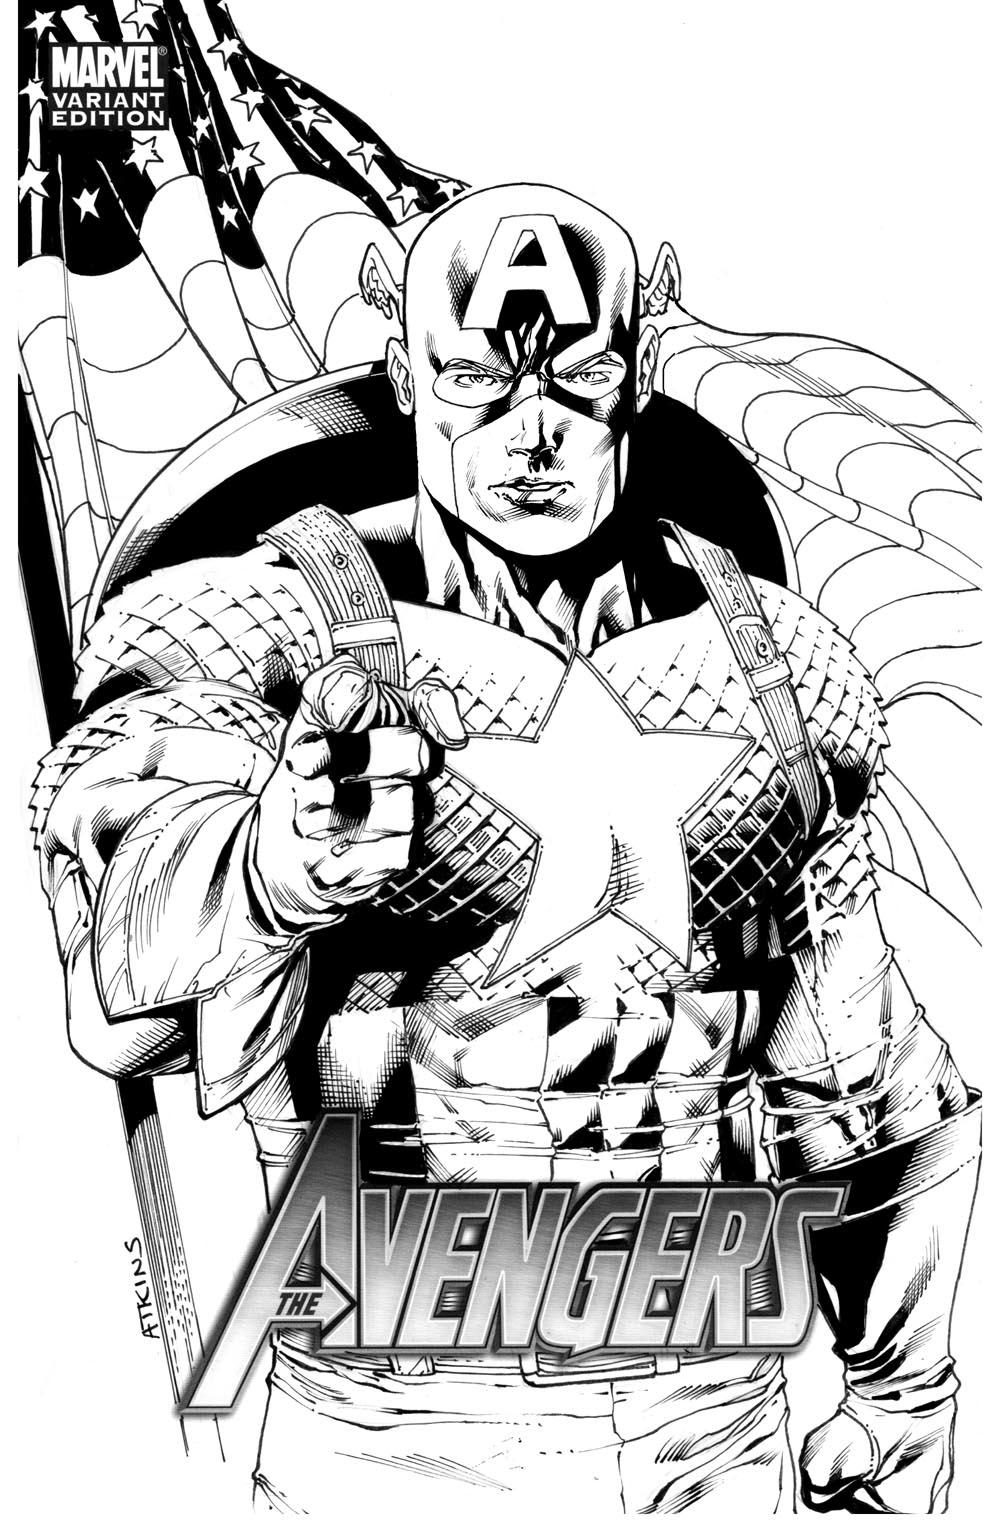 Robert Atkins Art: Captain America Grade 12....